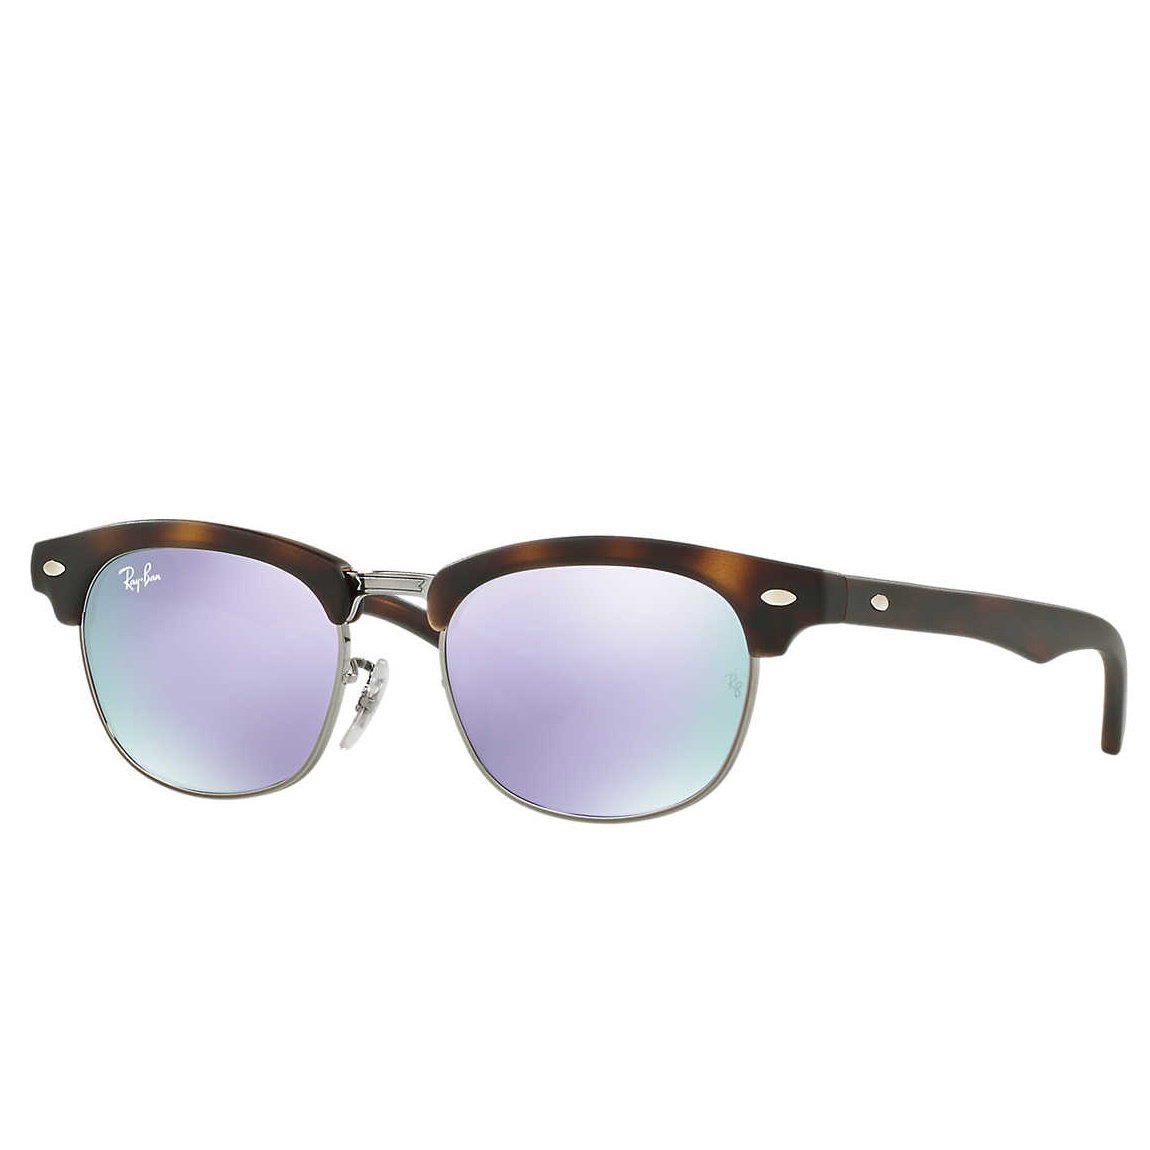 Ray-Ban Jr Clubmaster Sunglasses - Matte Tort/ Mirror Lilac